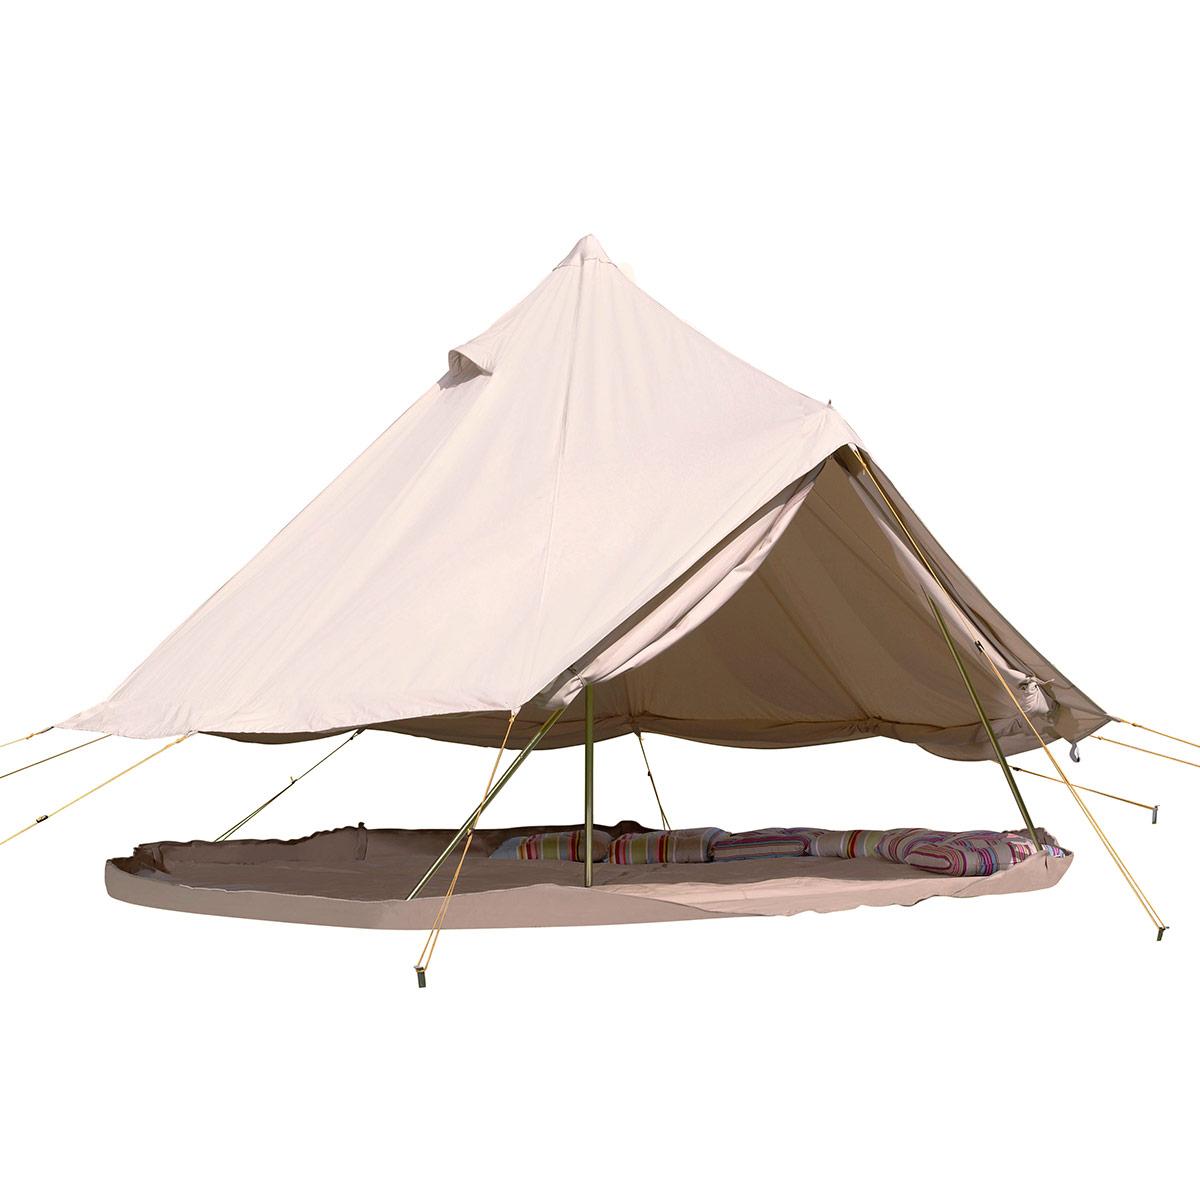 SoulPad 4000-hybrid-G Bell Tent